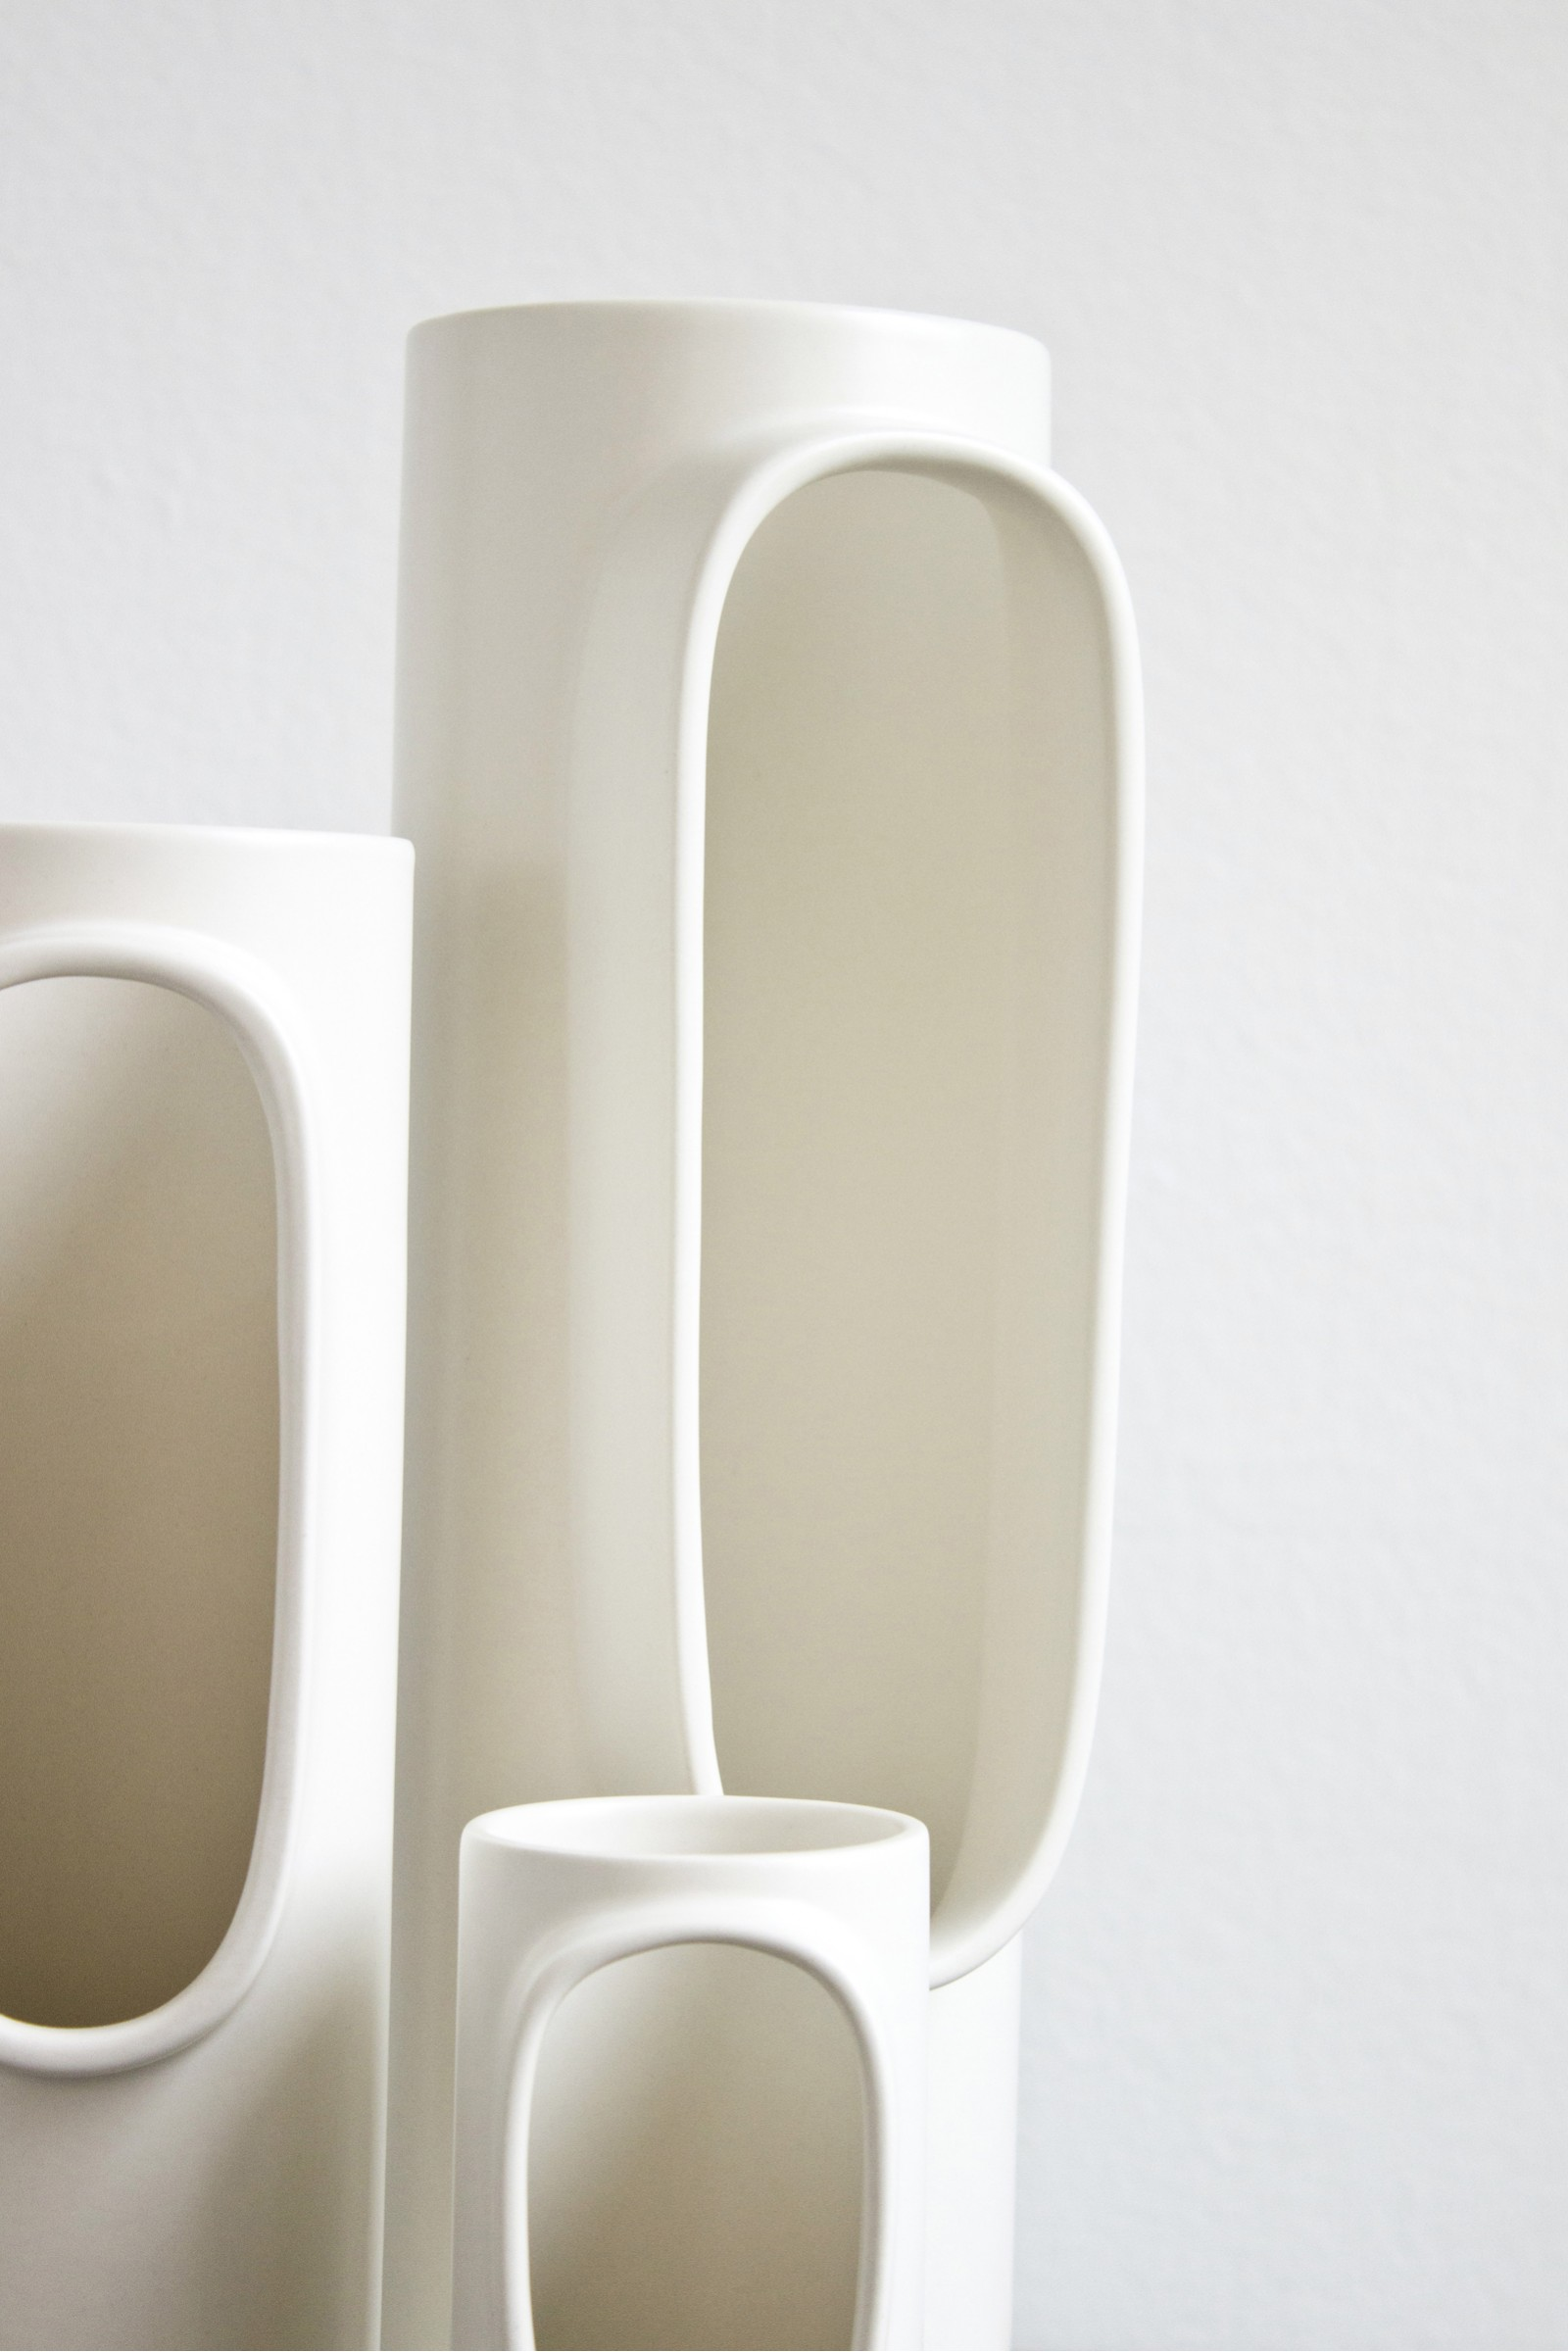 vase-design-kodama-comingb-02